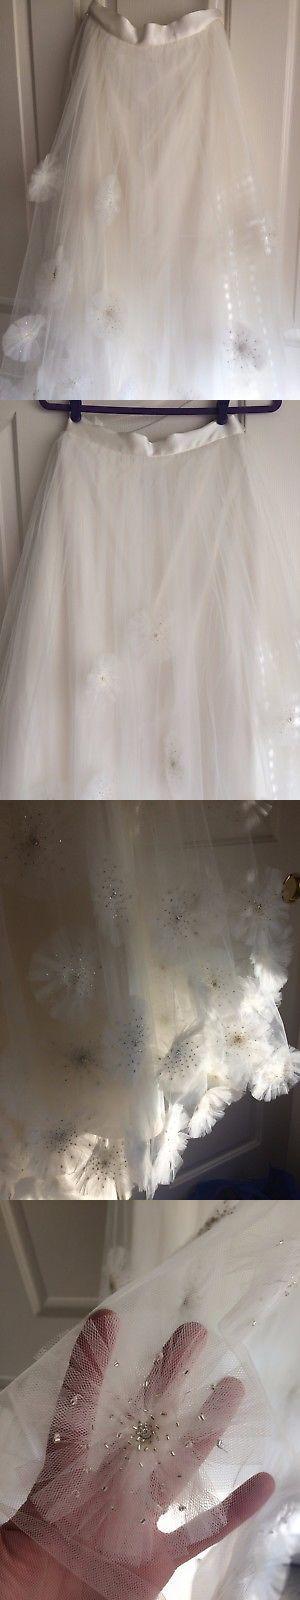 Wedding Dresses: Bhldn Anthropologie Callistemon Ivory Wedding Skirt Nwot Size 4 -> BUY IT NOW ONLY: $200 on eBay!